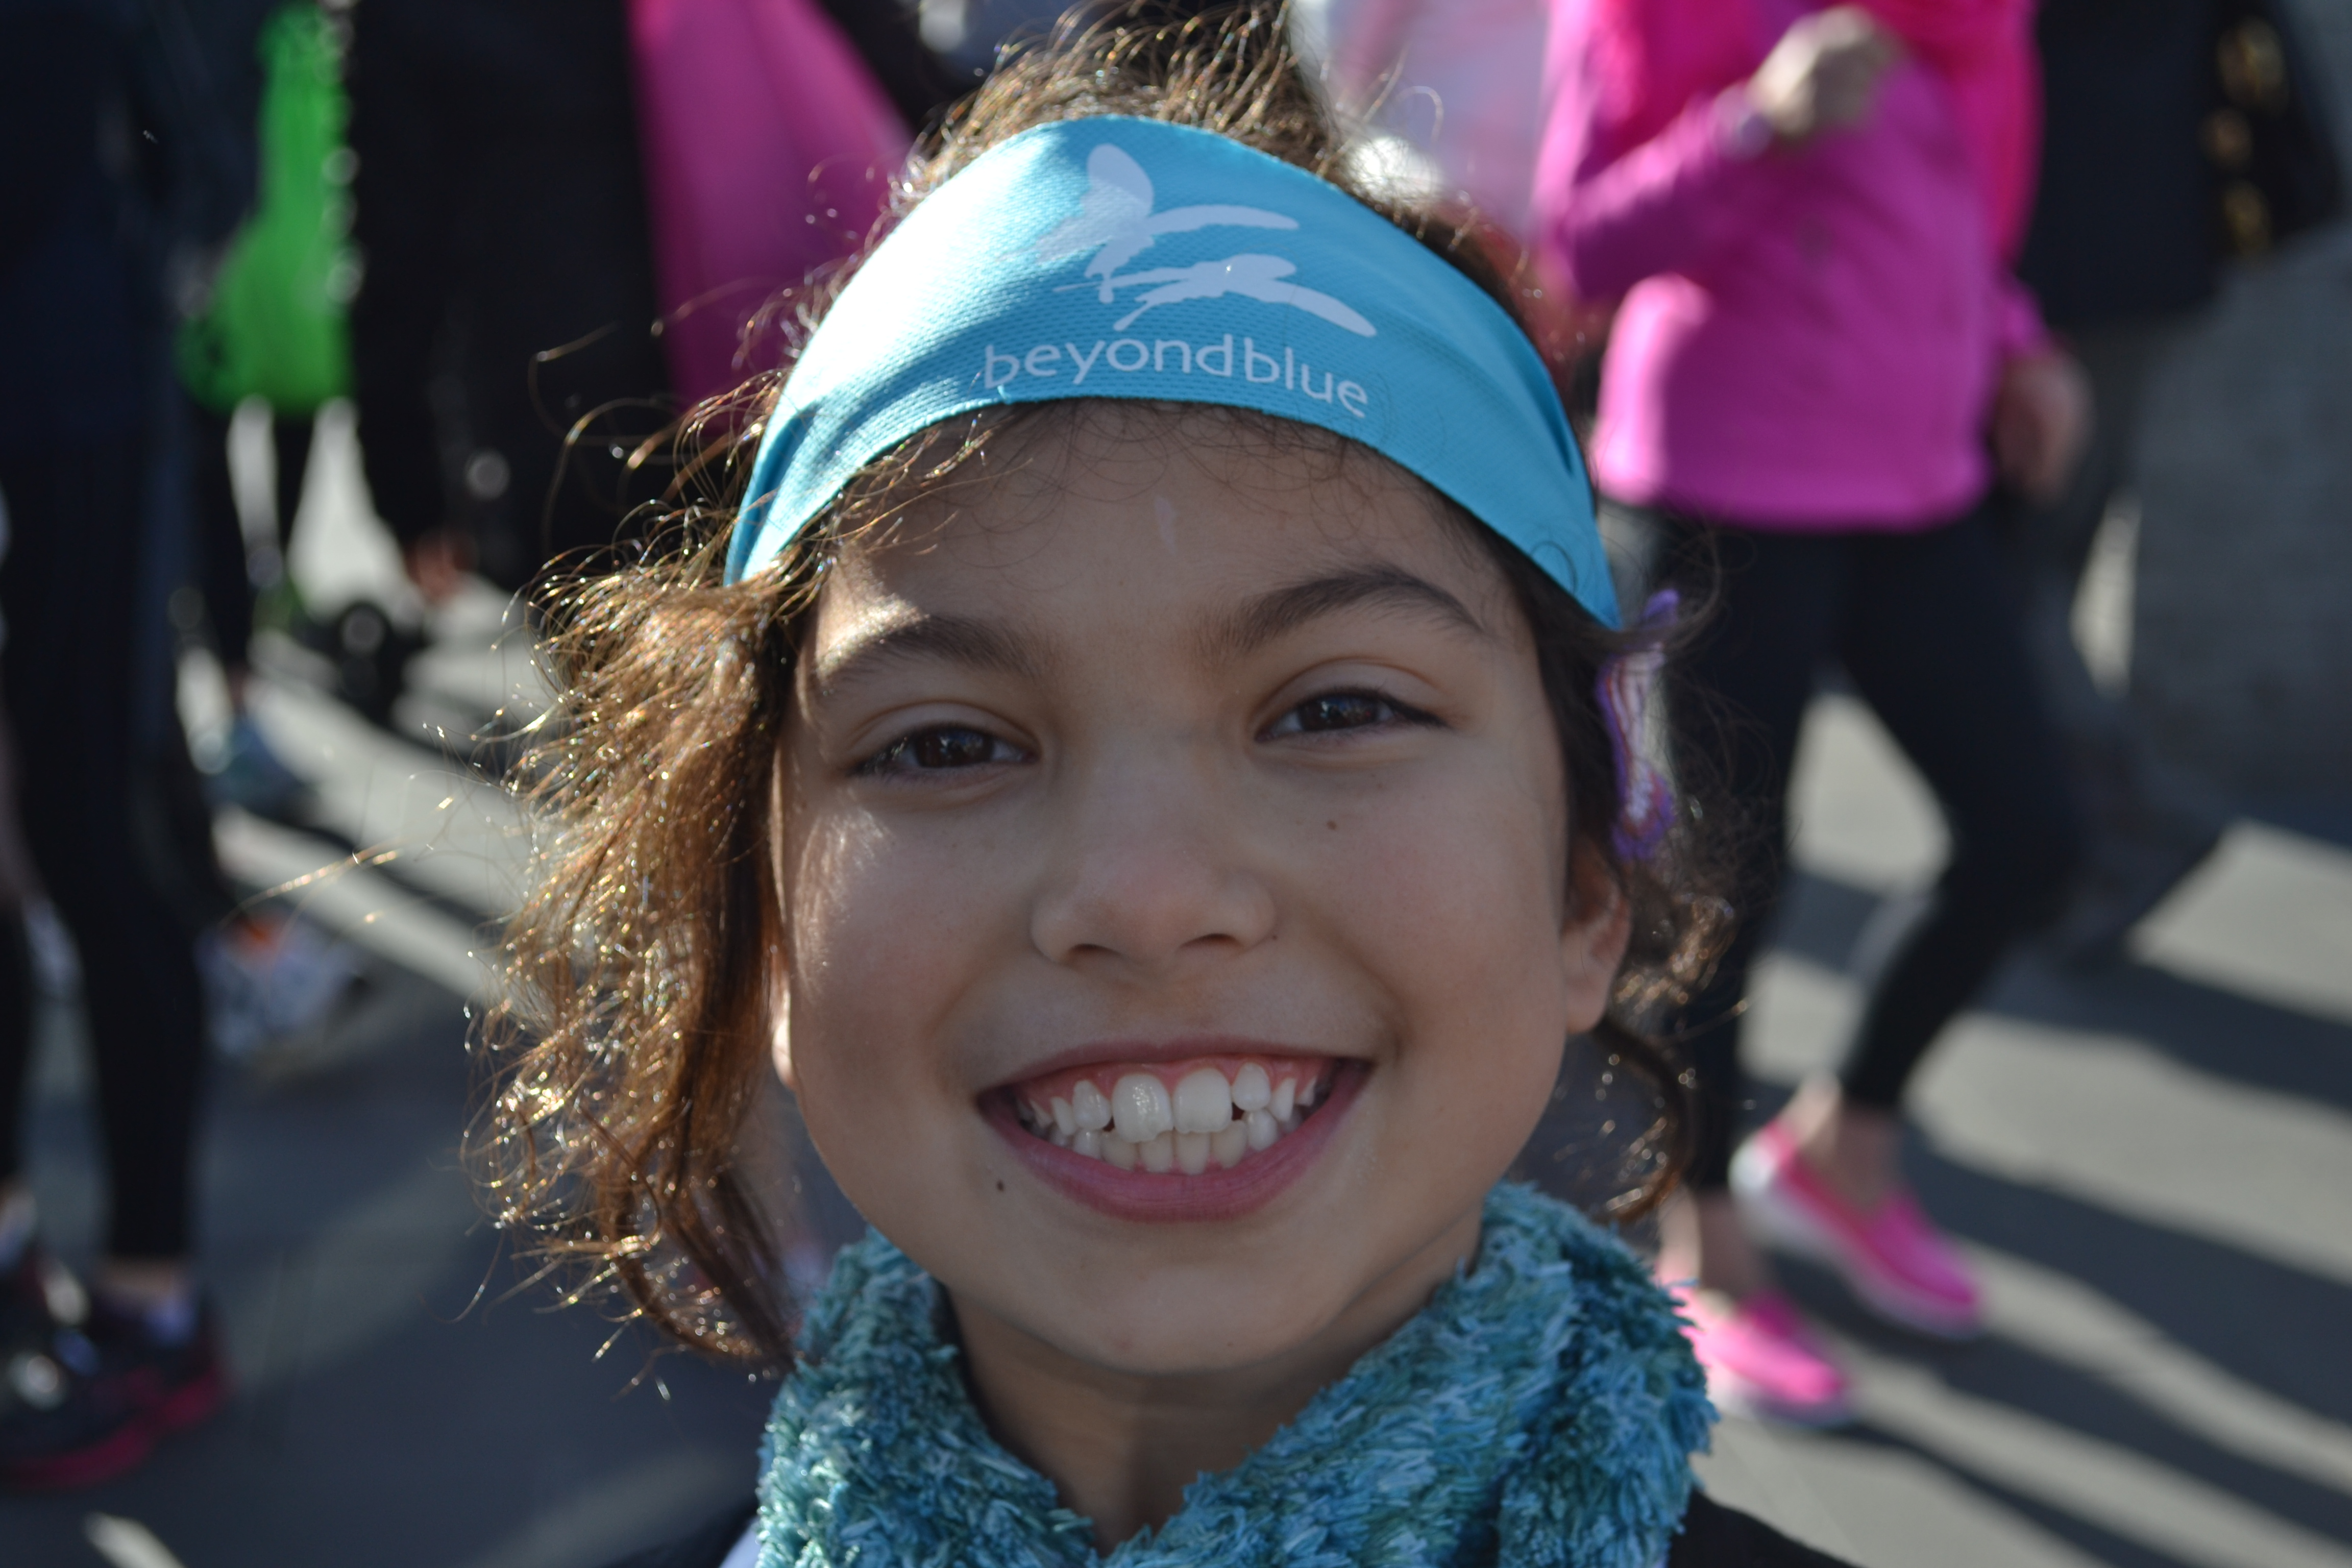 Beyond Blue headbands were a popular accessory at Run Melbourne.